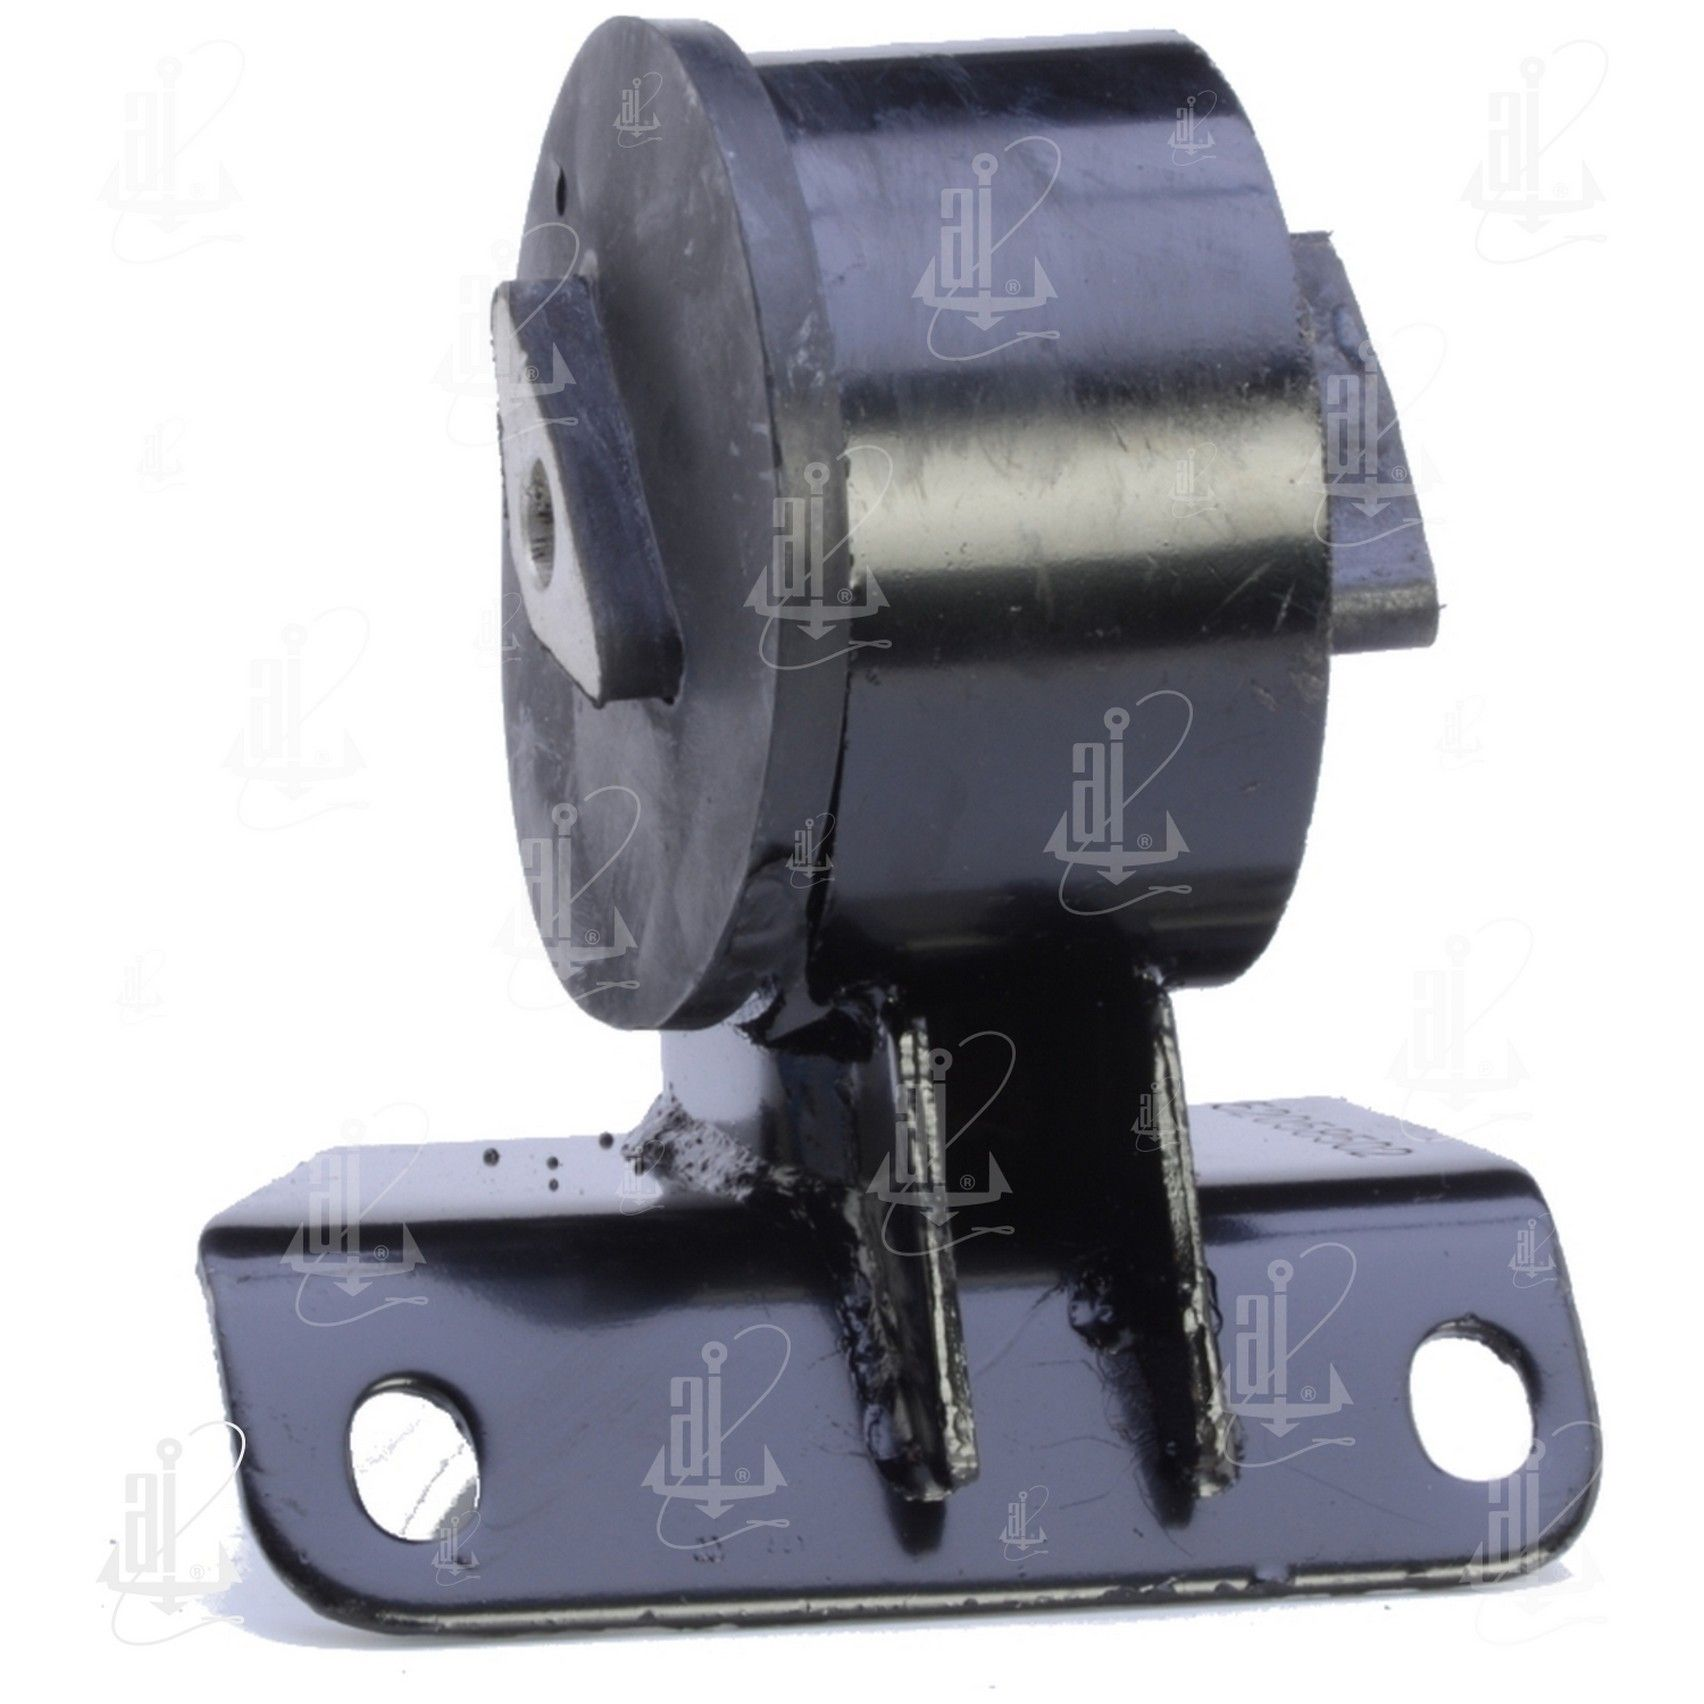 Anchor 2794 Engine Mount